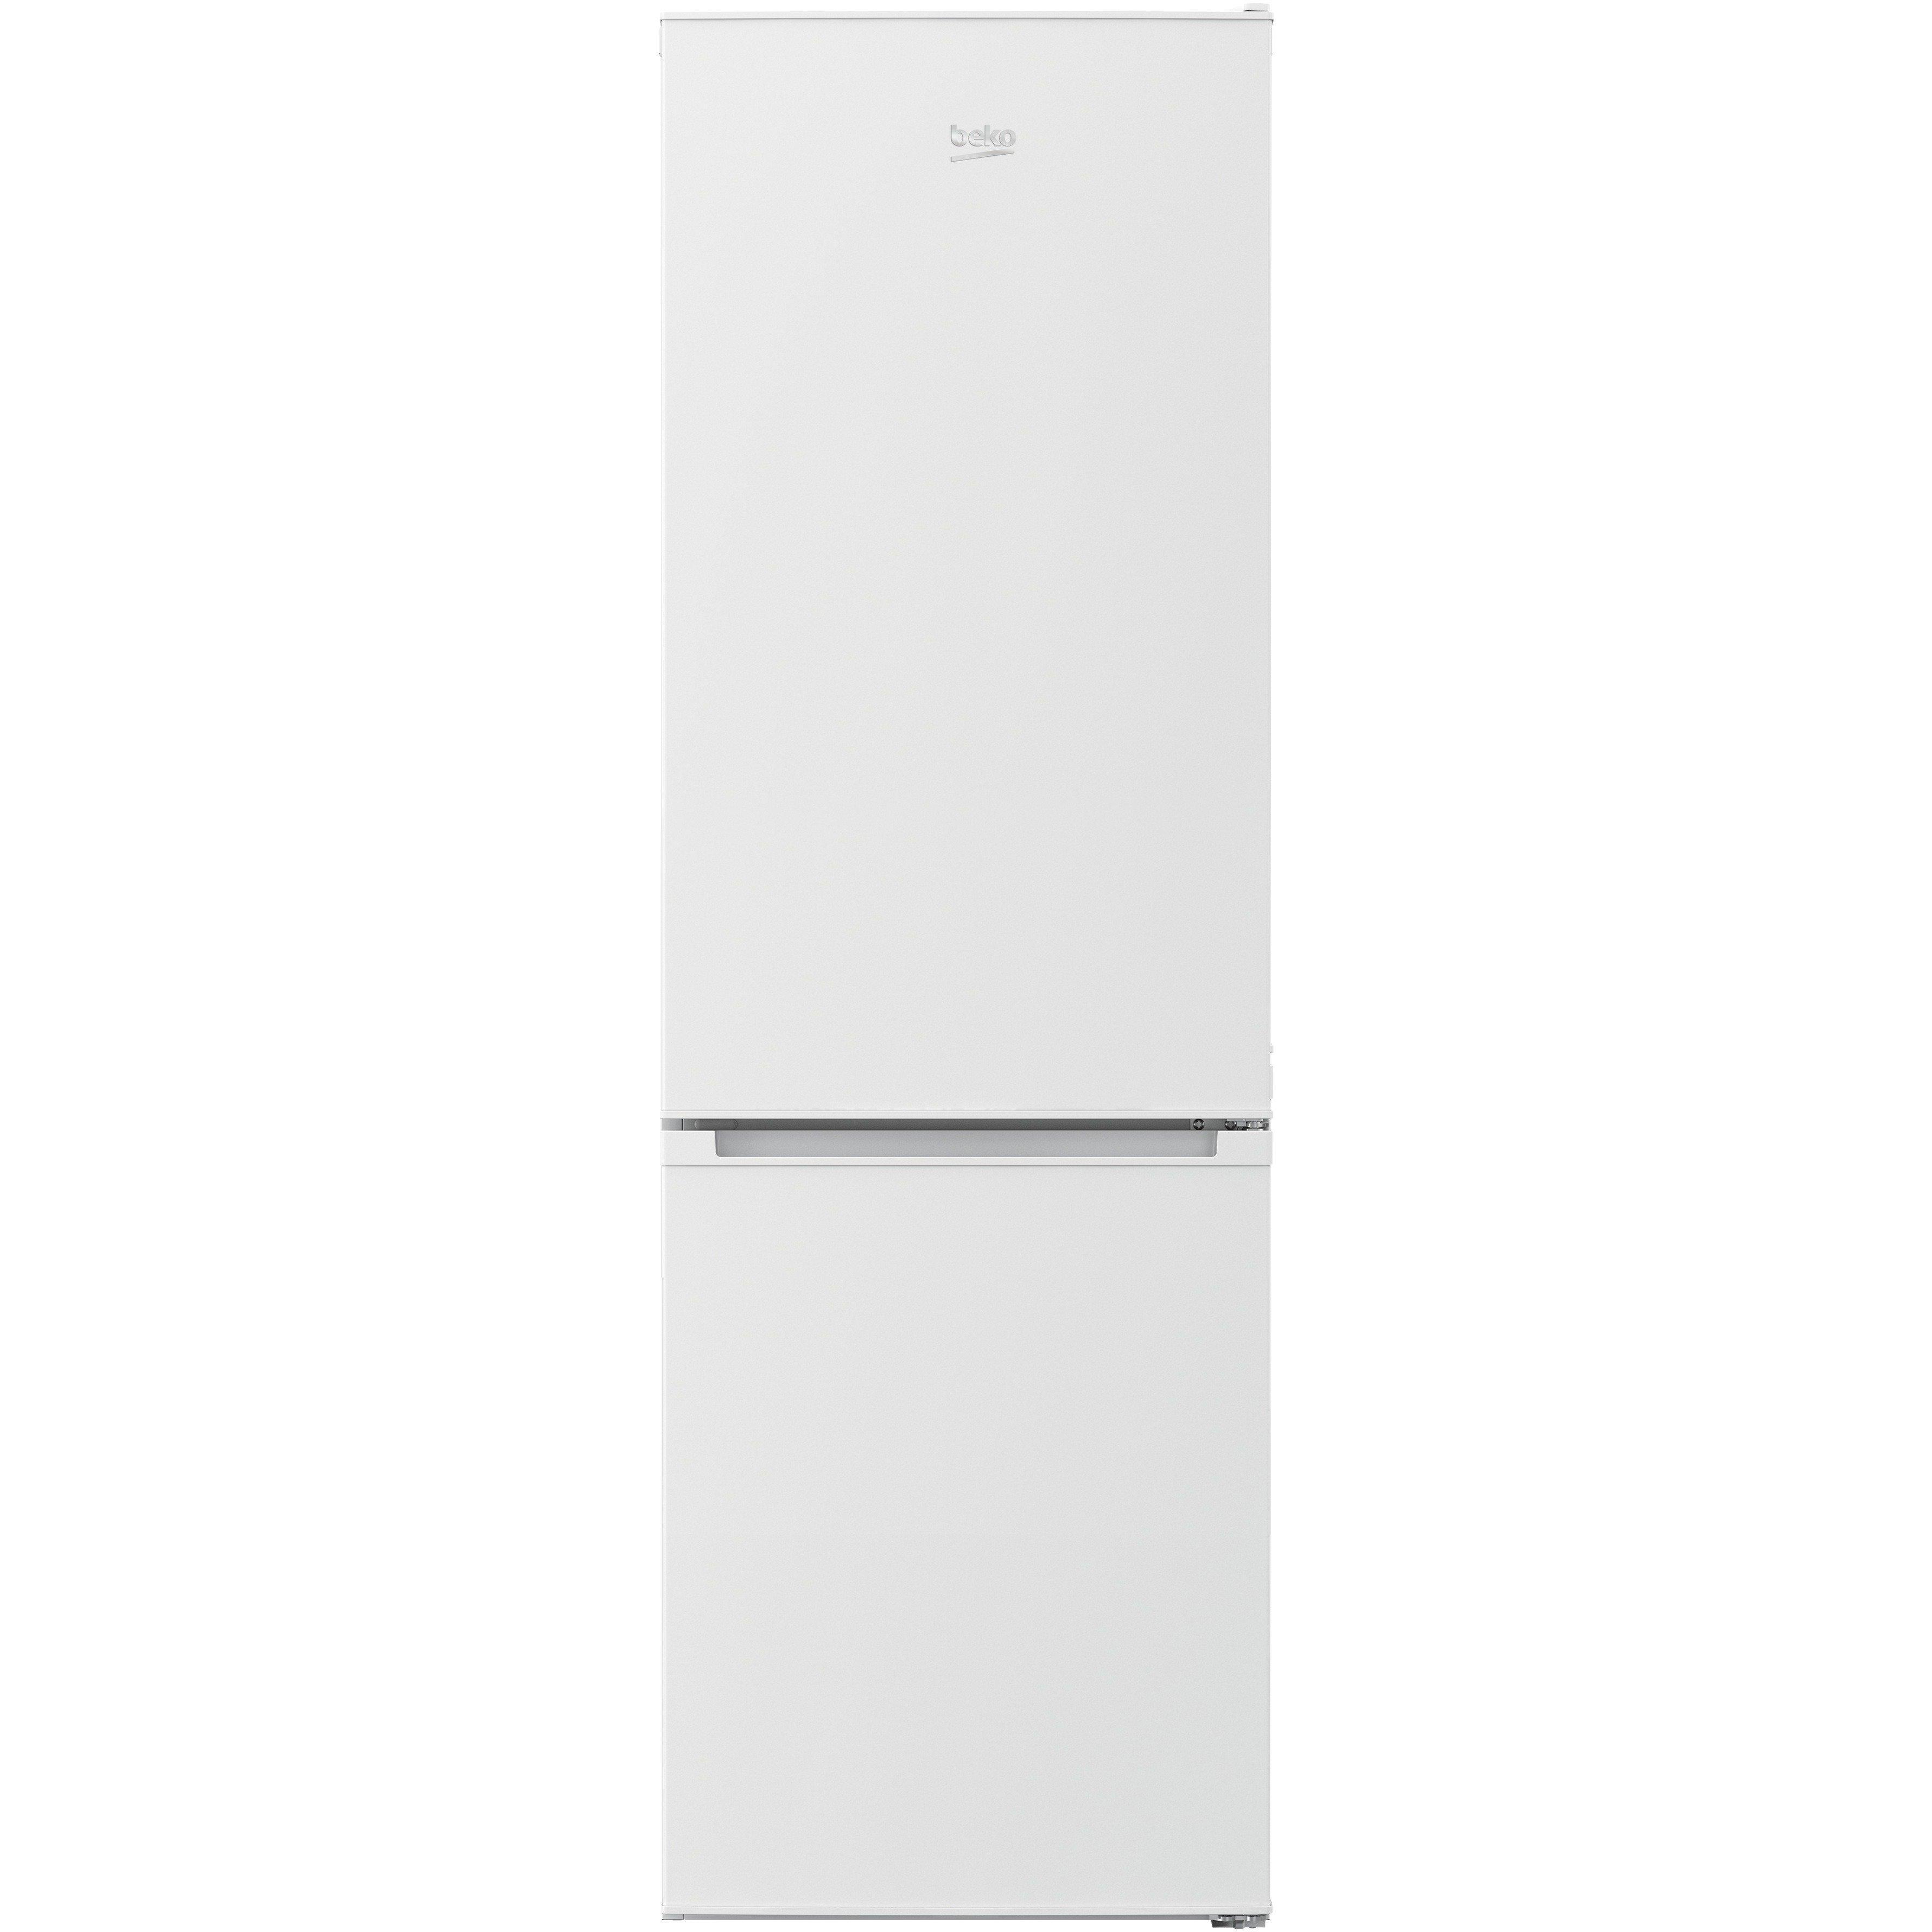 beko fridge zer manual ultimate user guide u2022 rh megauserguide today